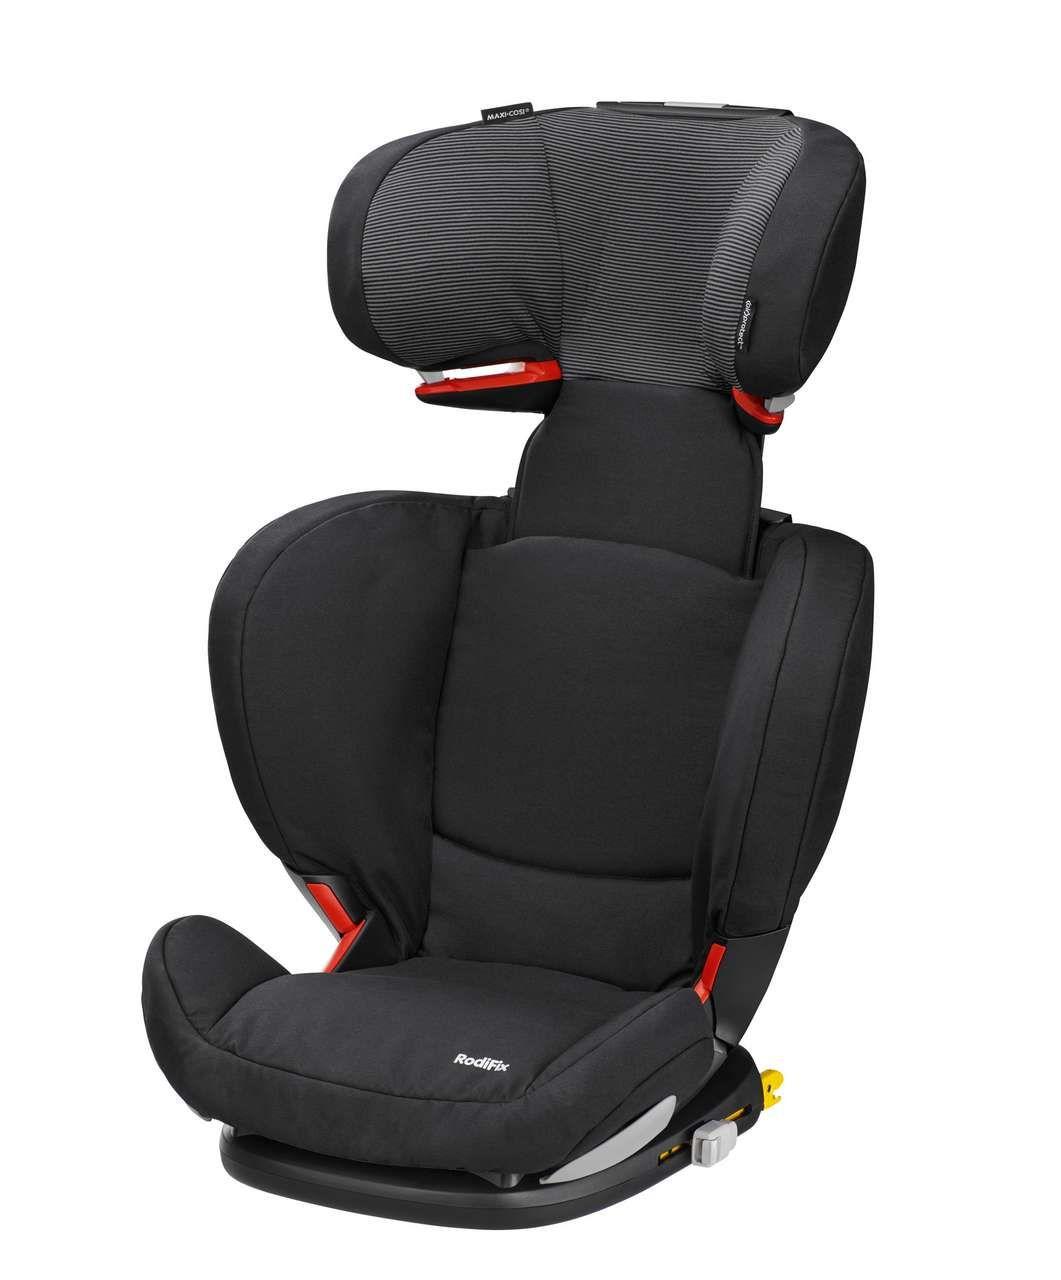 Maxi Cosi Rodifix Car Seat Black Raven Junior Group 2 3 Mamas Papas Baby Car Seats Car Seats Maxi Cosi Car Seat